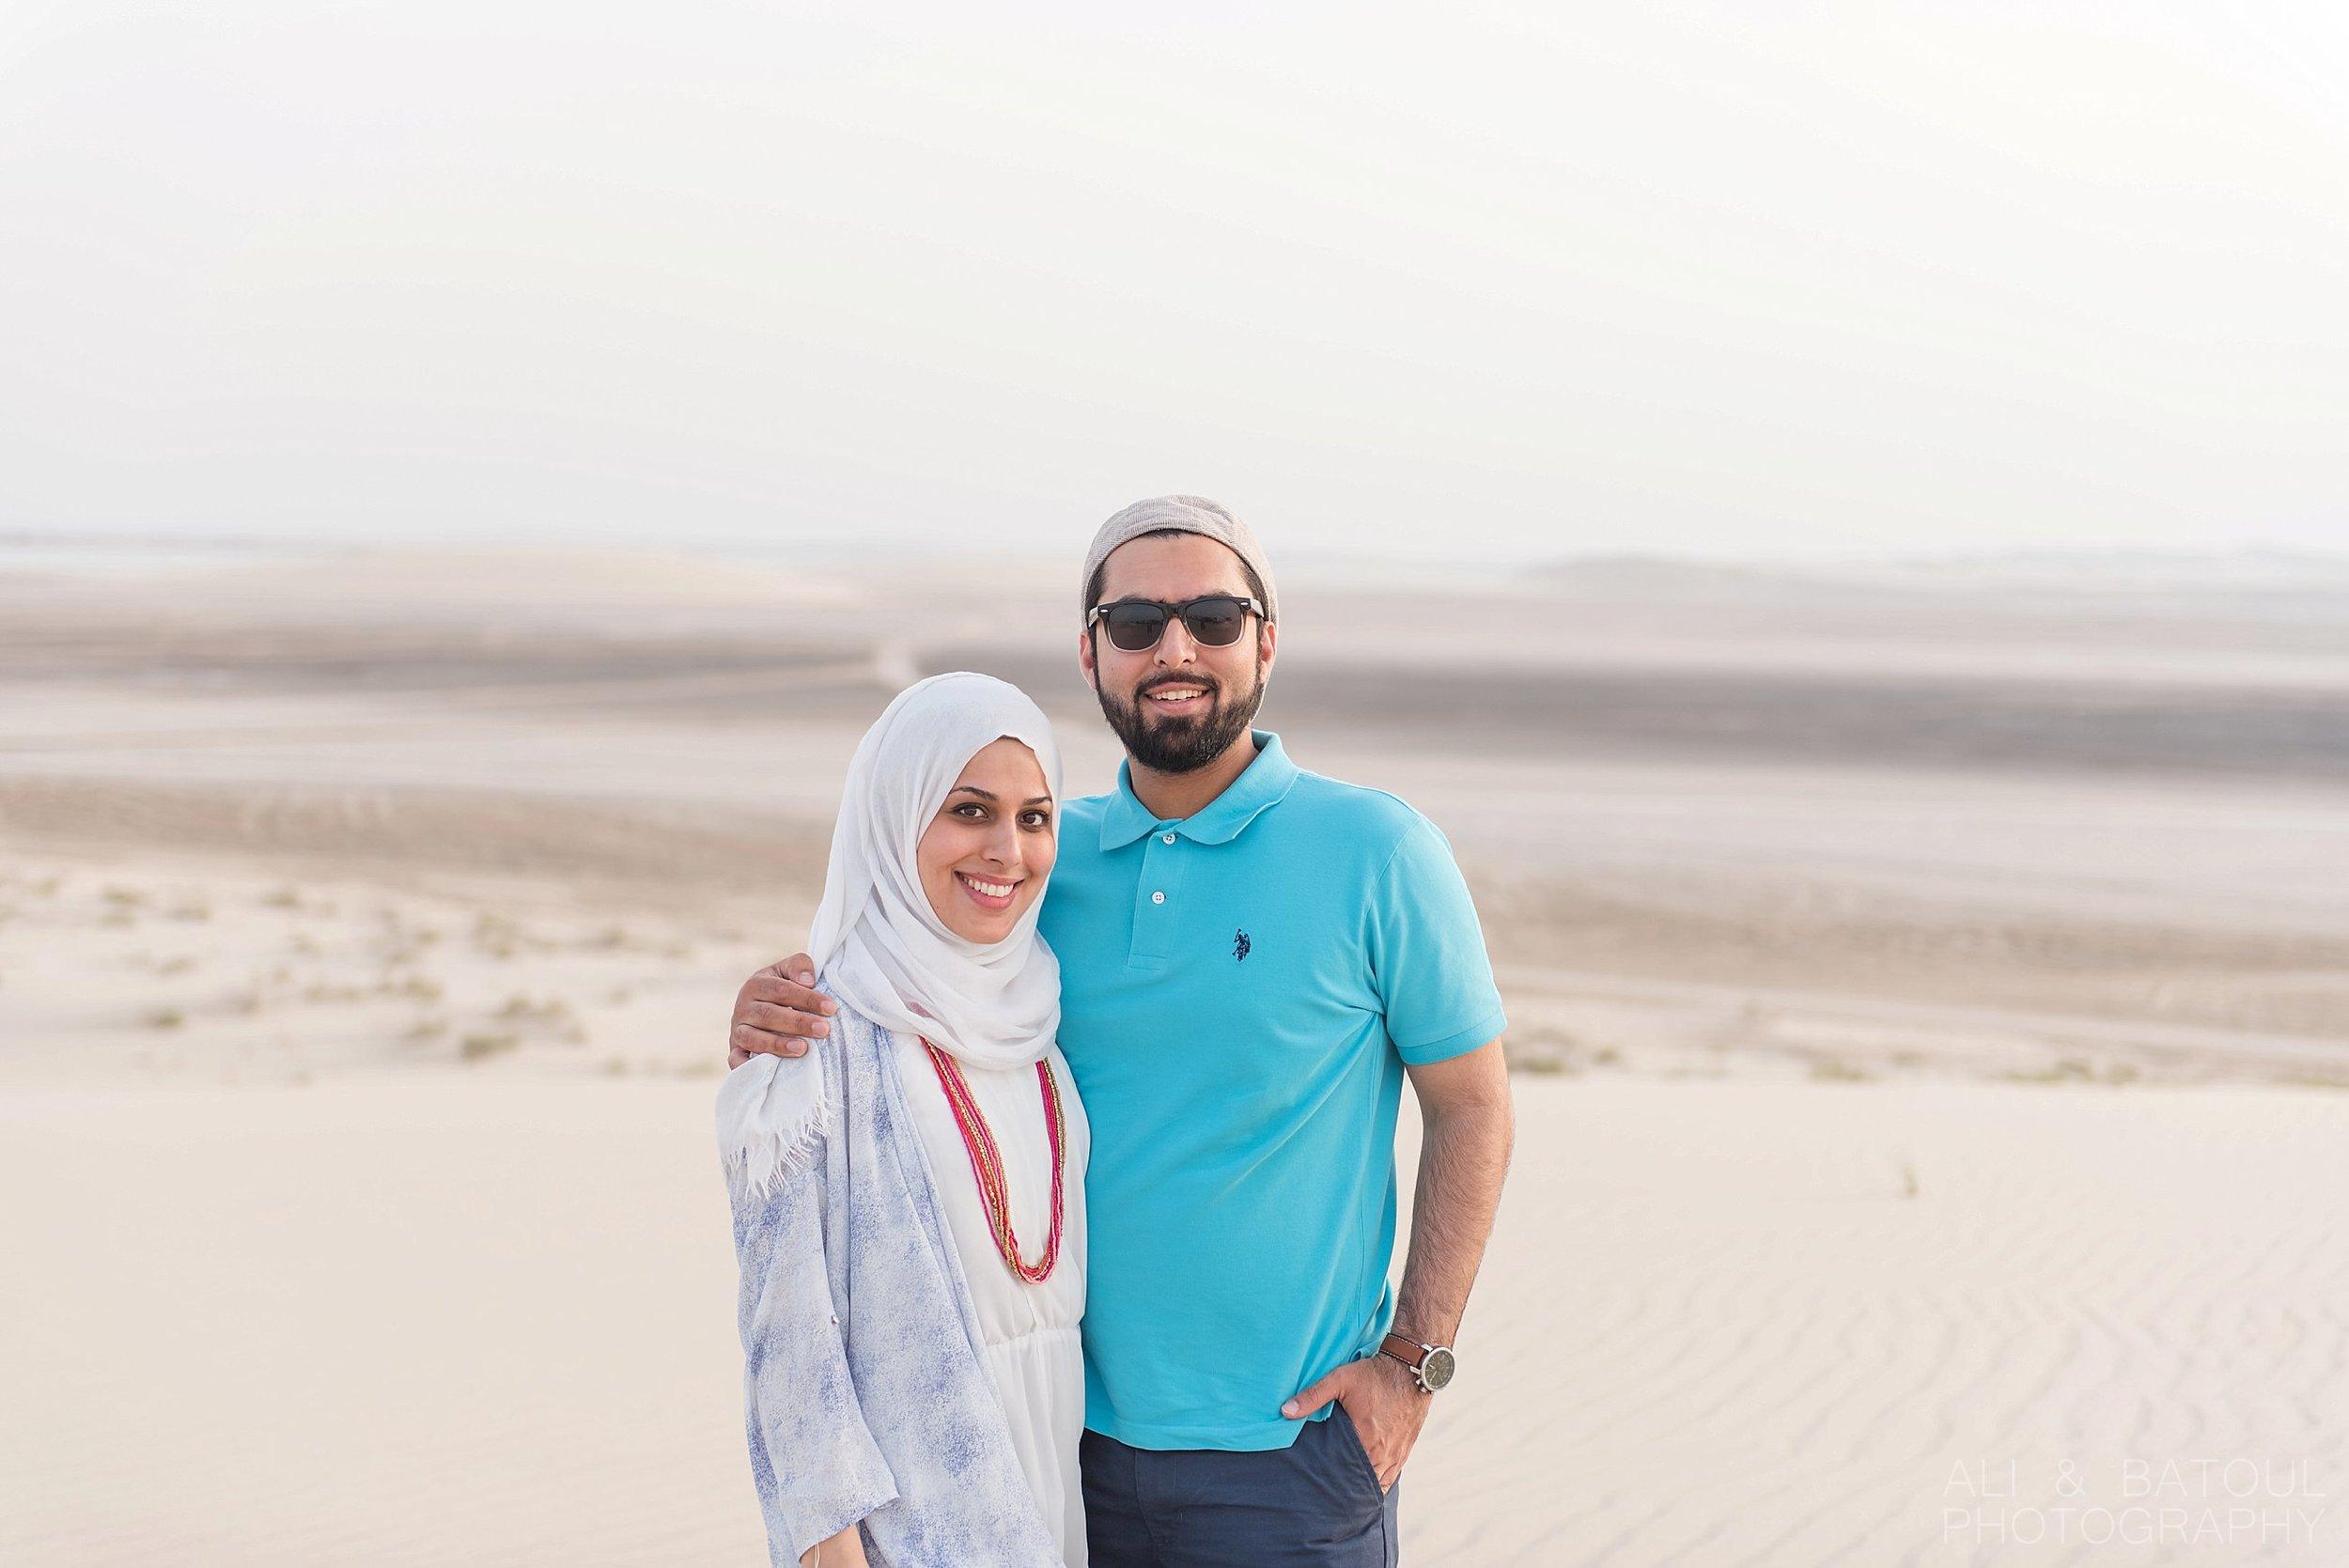 Ali & Batoul Photography - Doha Travel Photography_0074.jpg